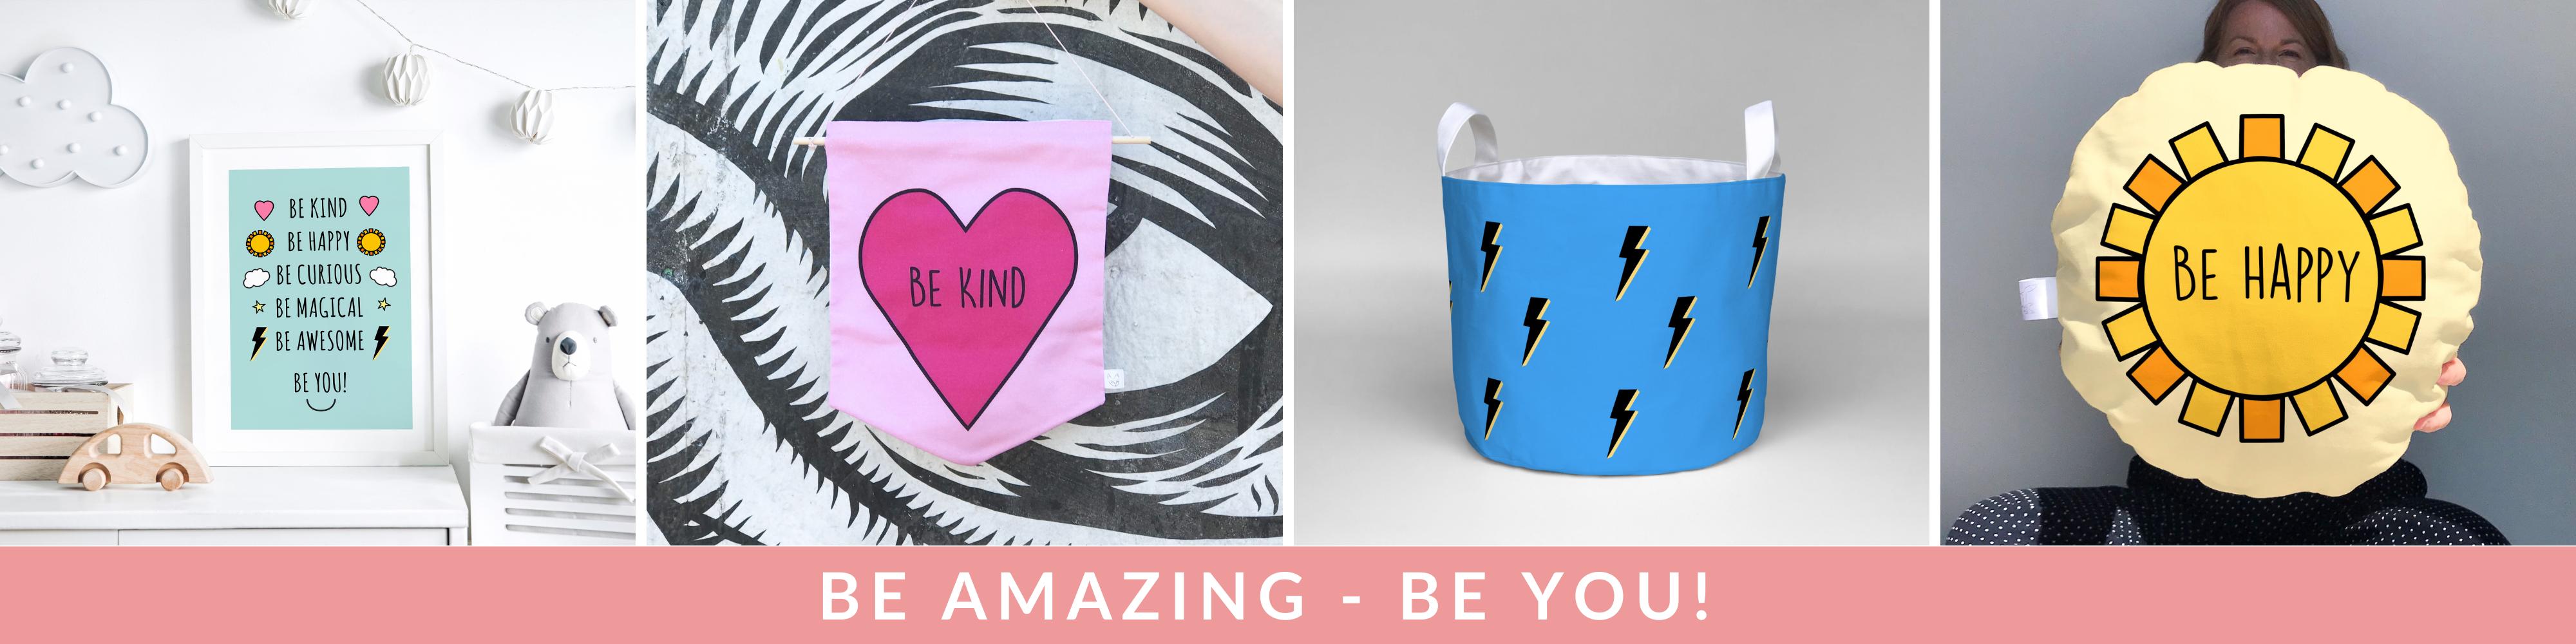 BE you - amazing kids decor